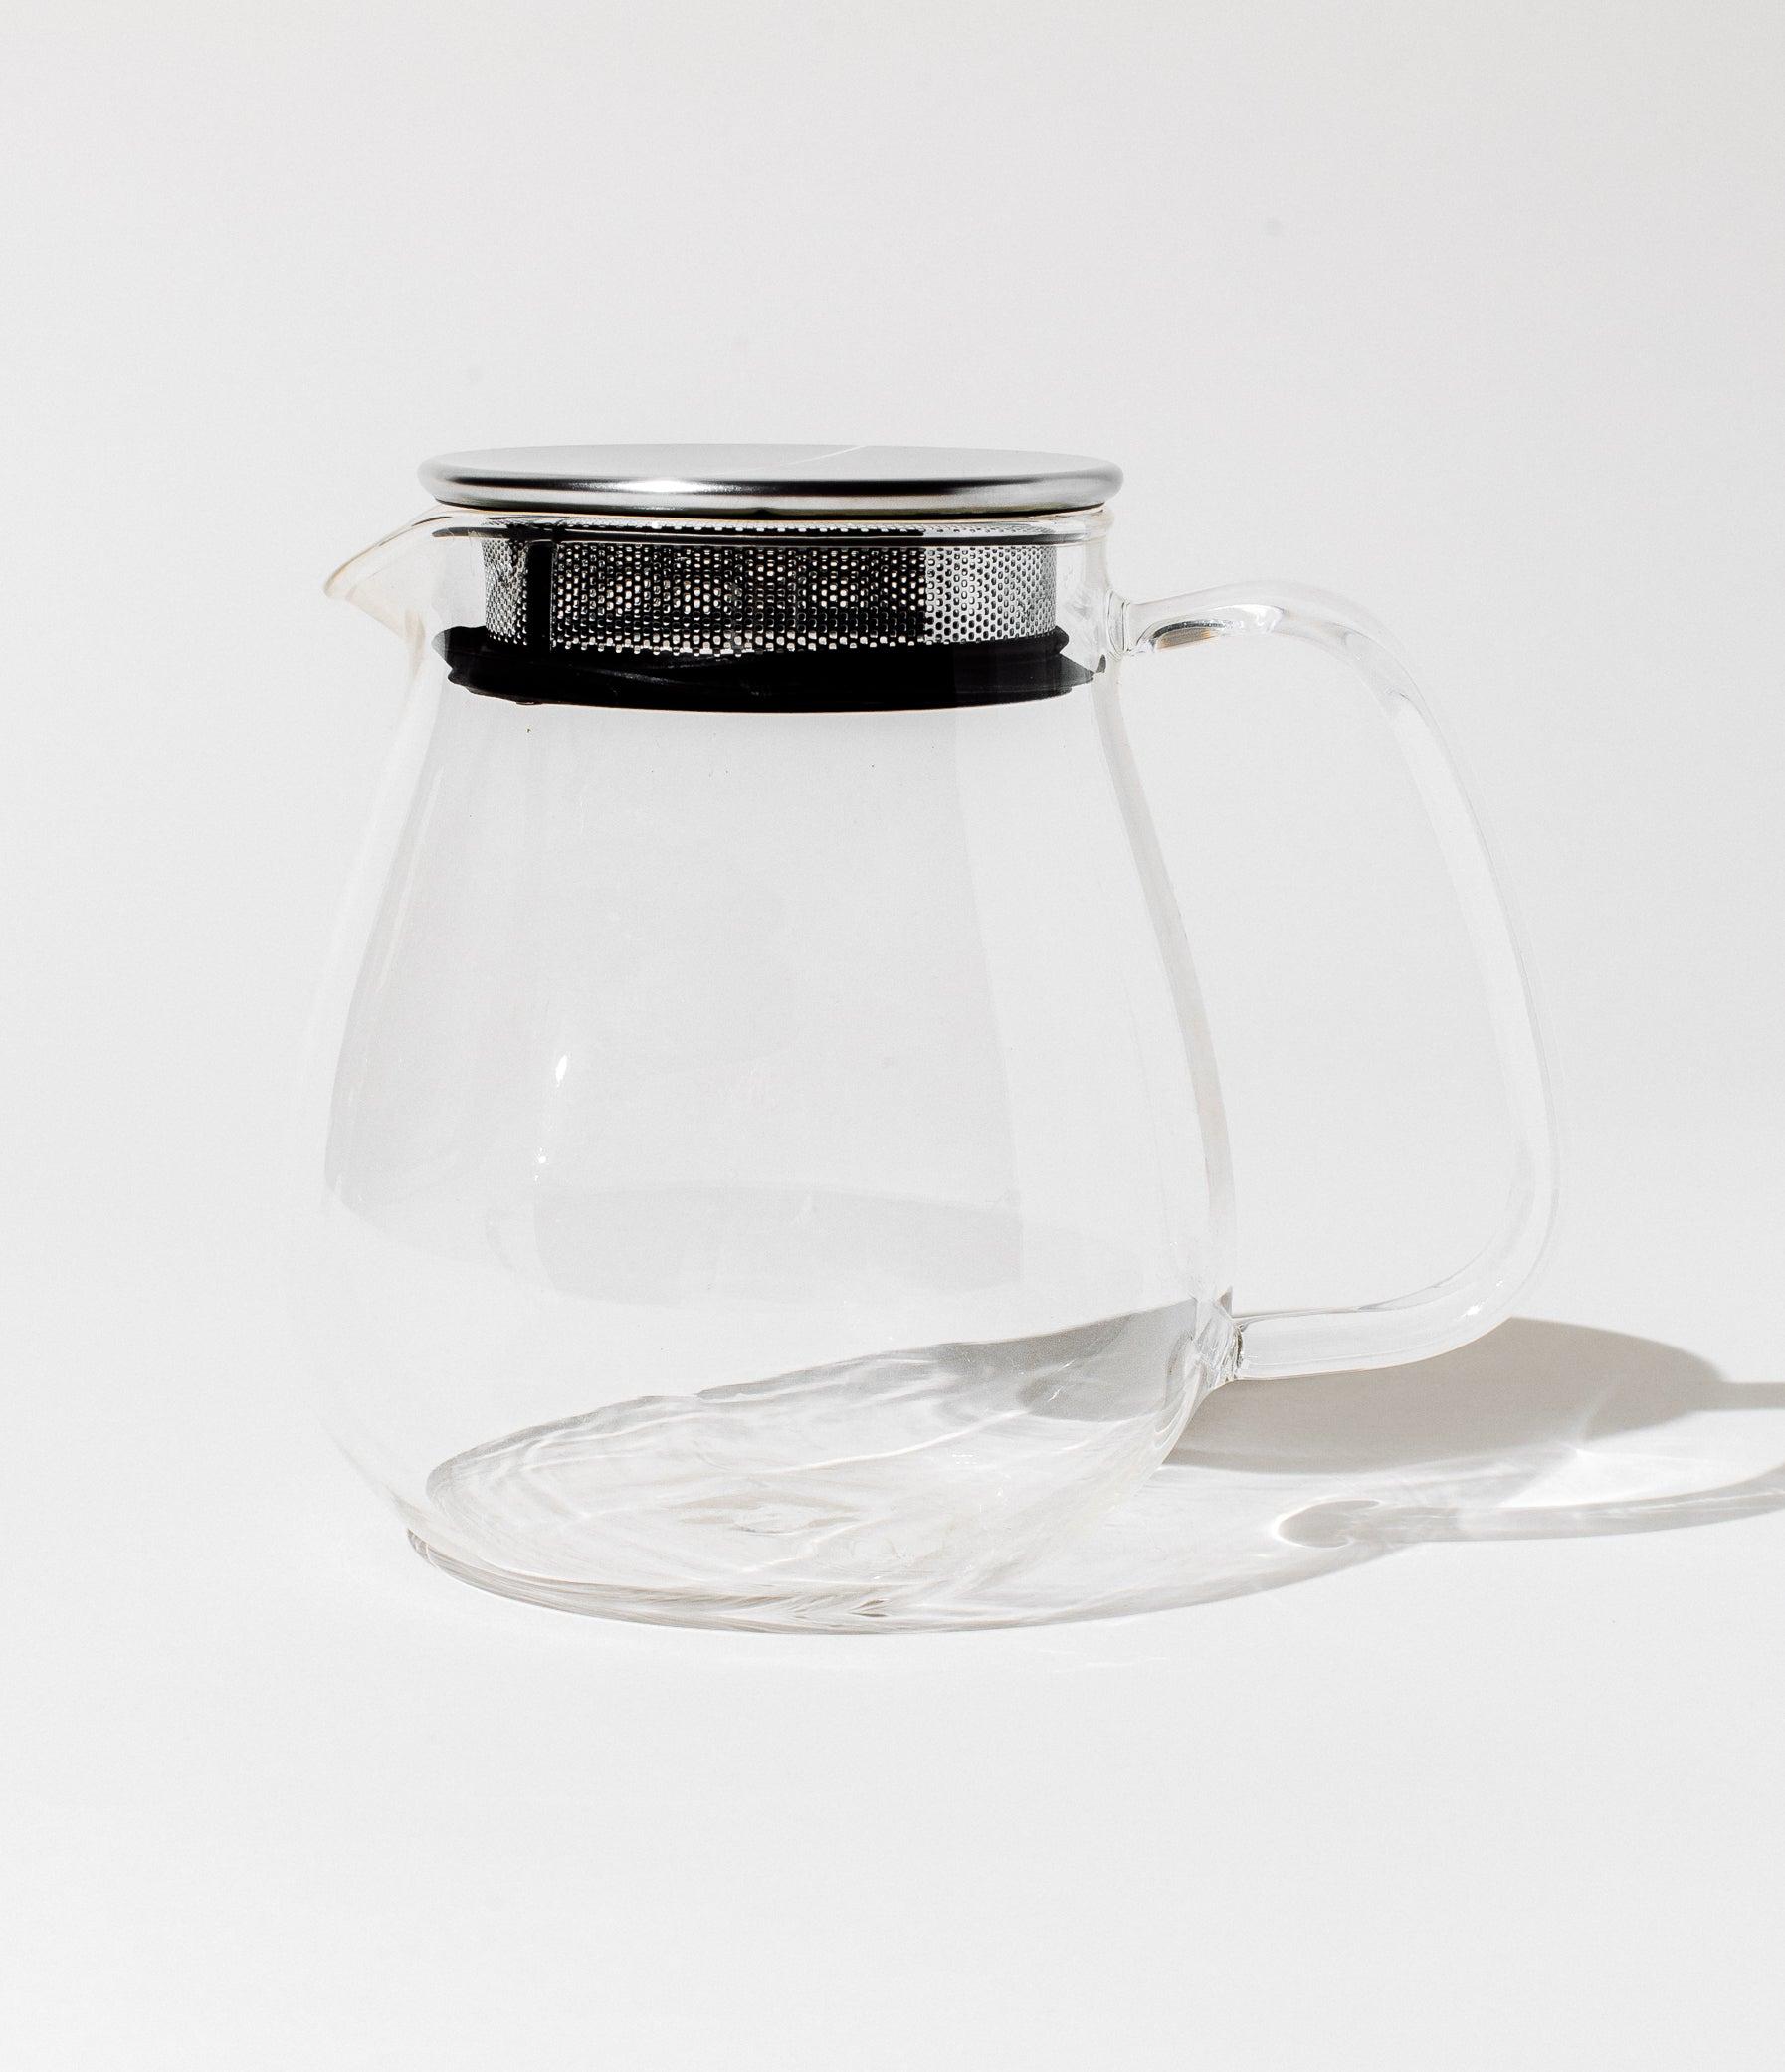 Kinto Glass Teapot Teaware 24 oz by Art of Tea